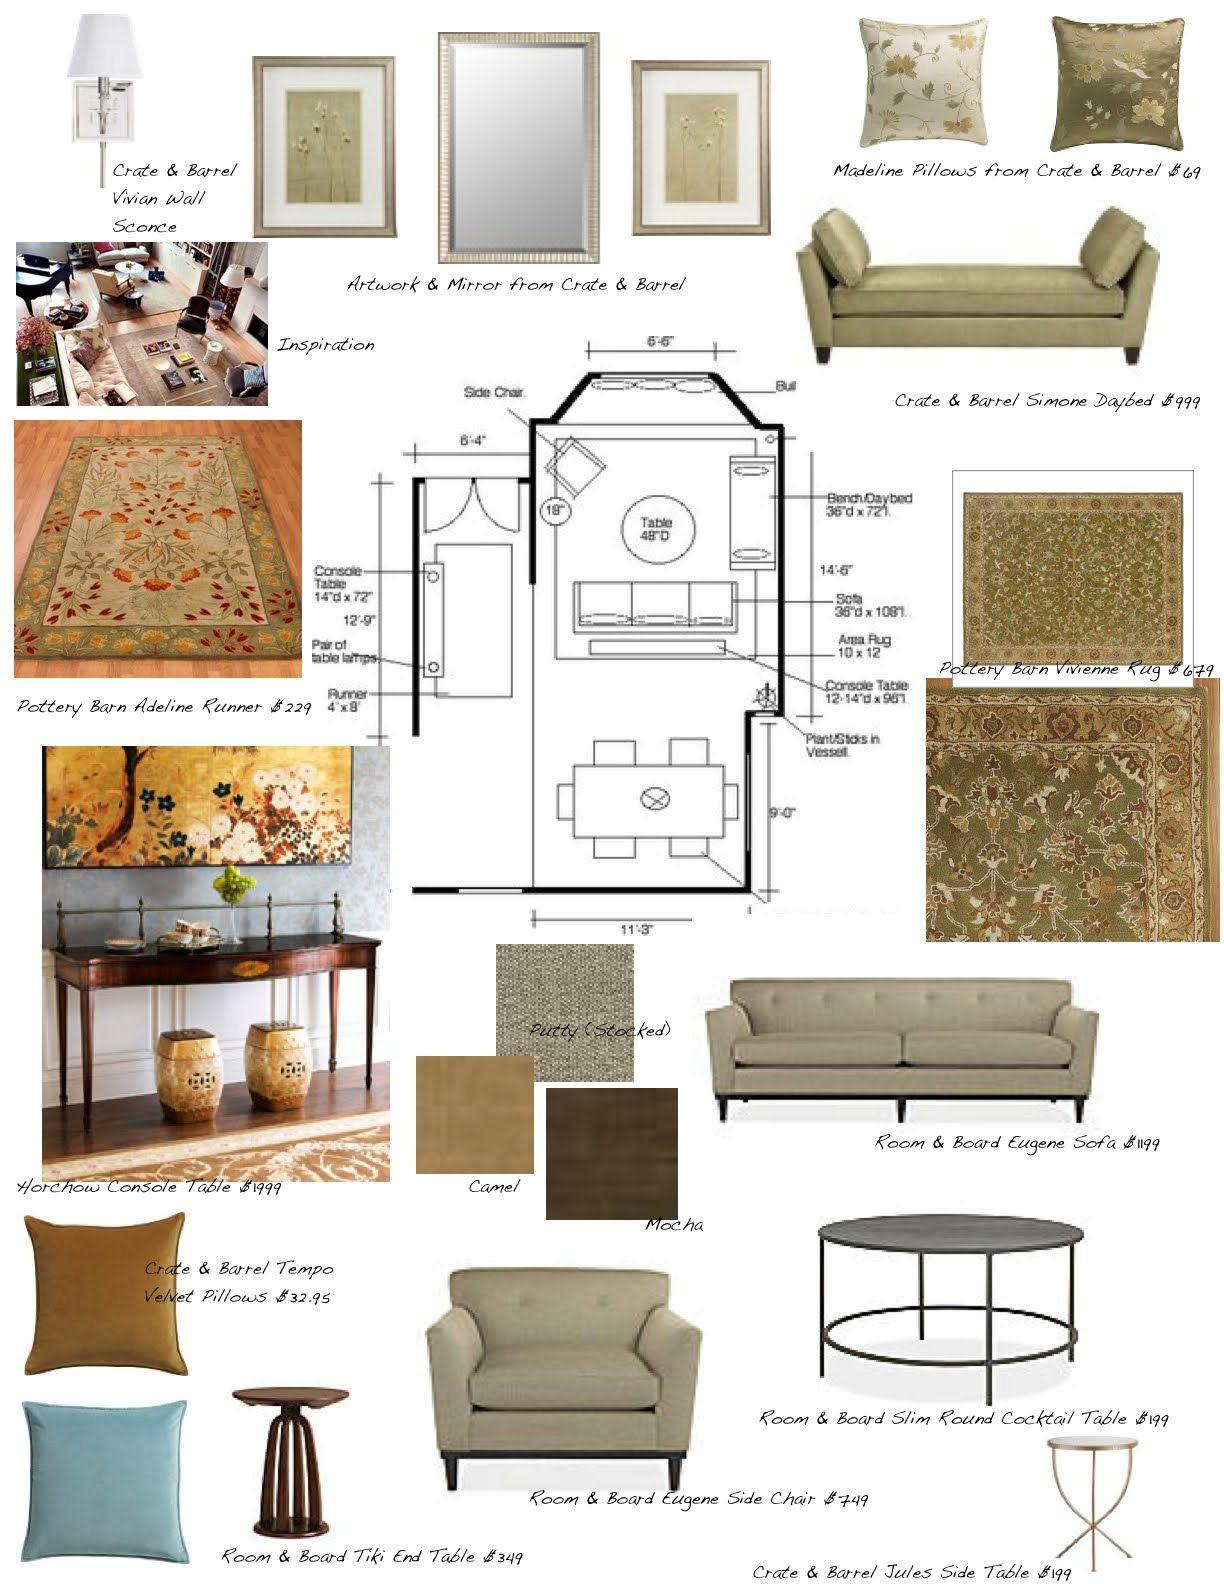 Jill Seidner Interior Design 450 Flat Rate Per Room Interior Design